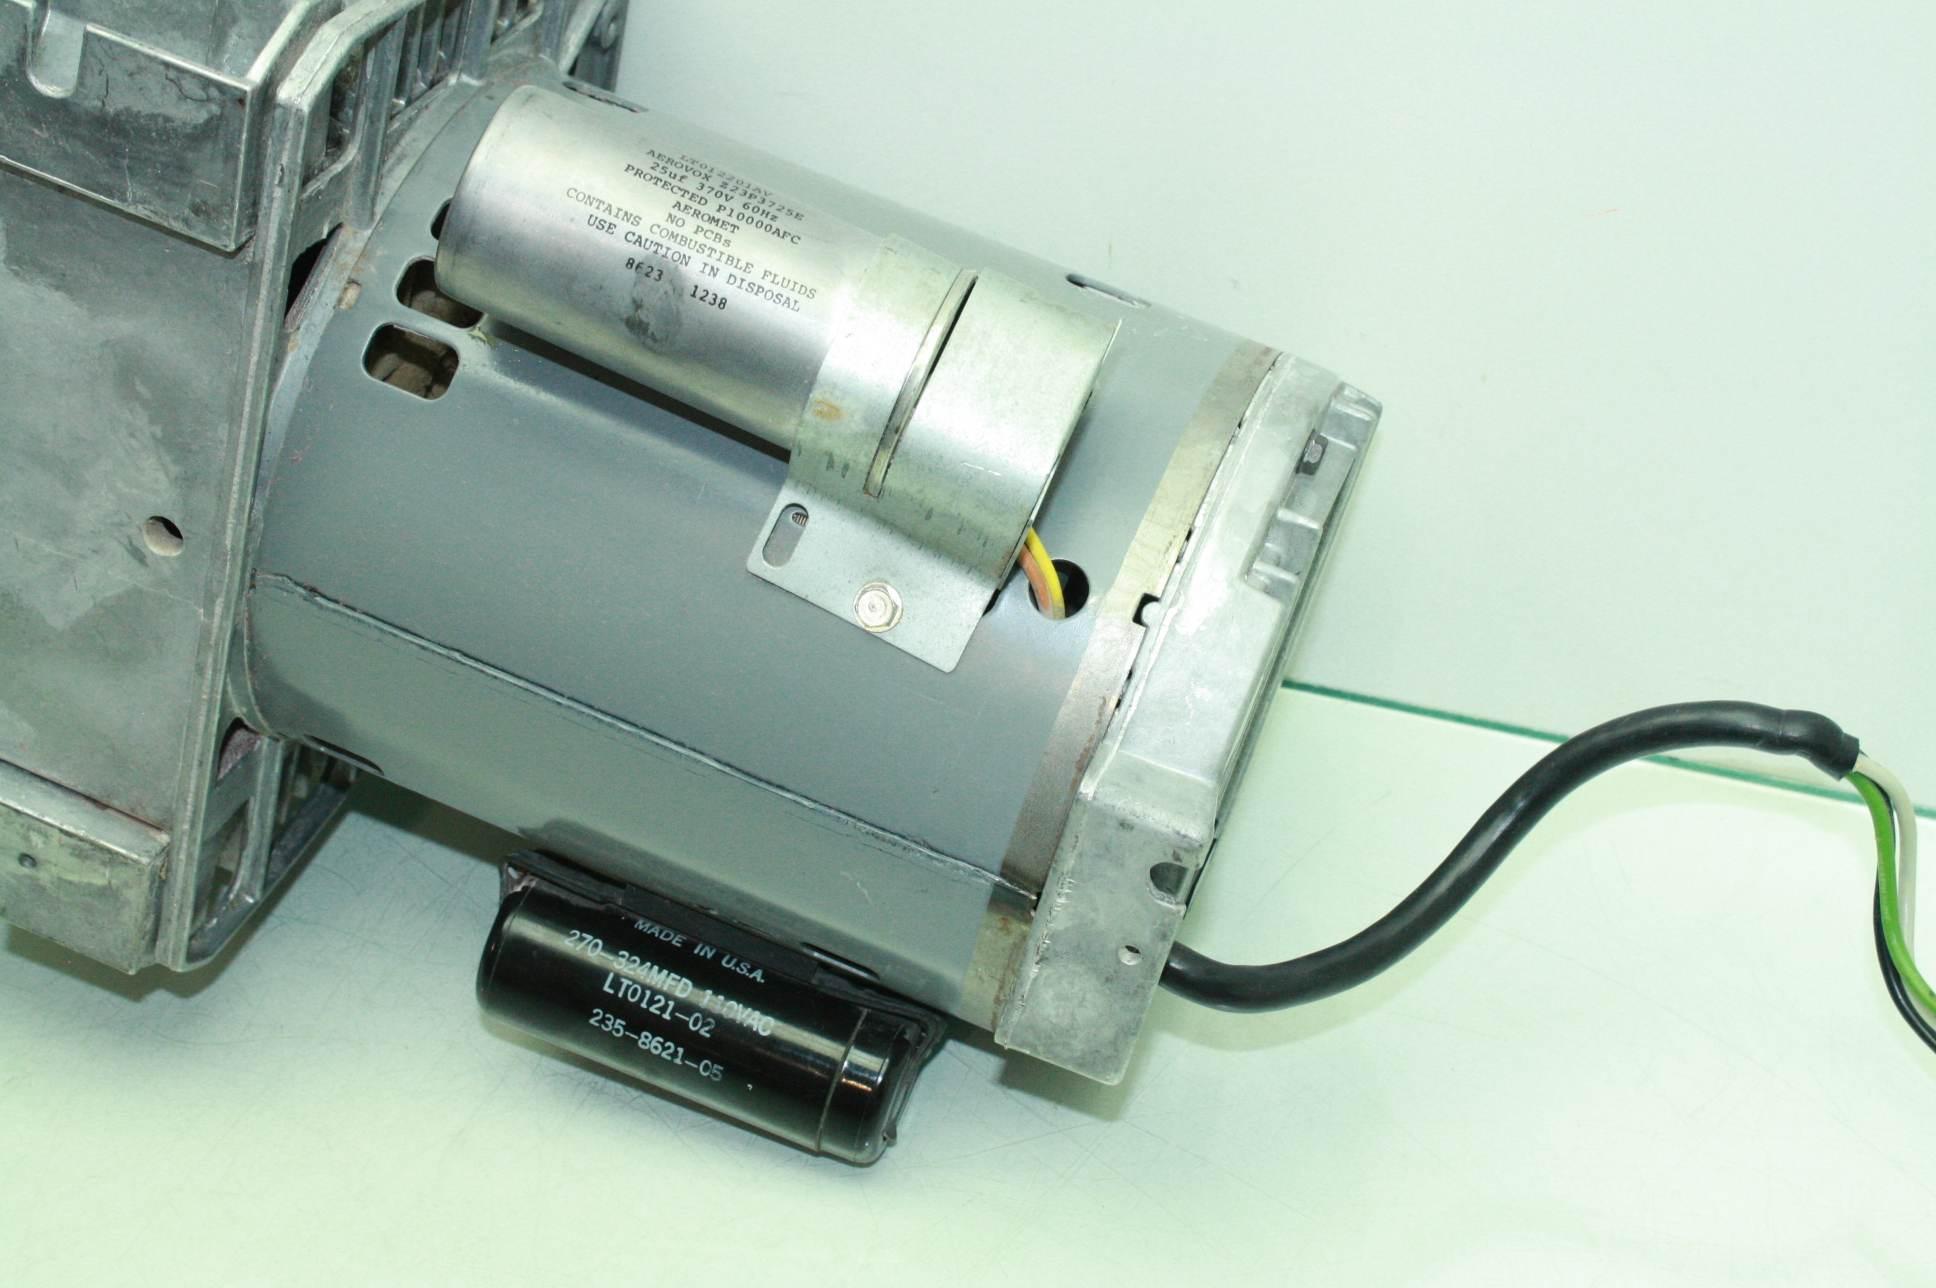 Campbell Hausfeld Superpal 1 5hp Sprayer Compressor Dk1378